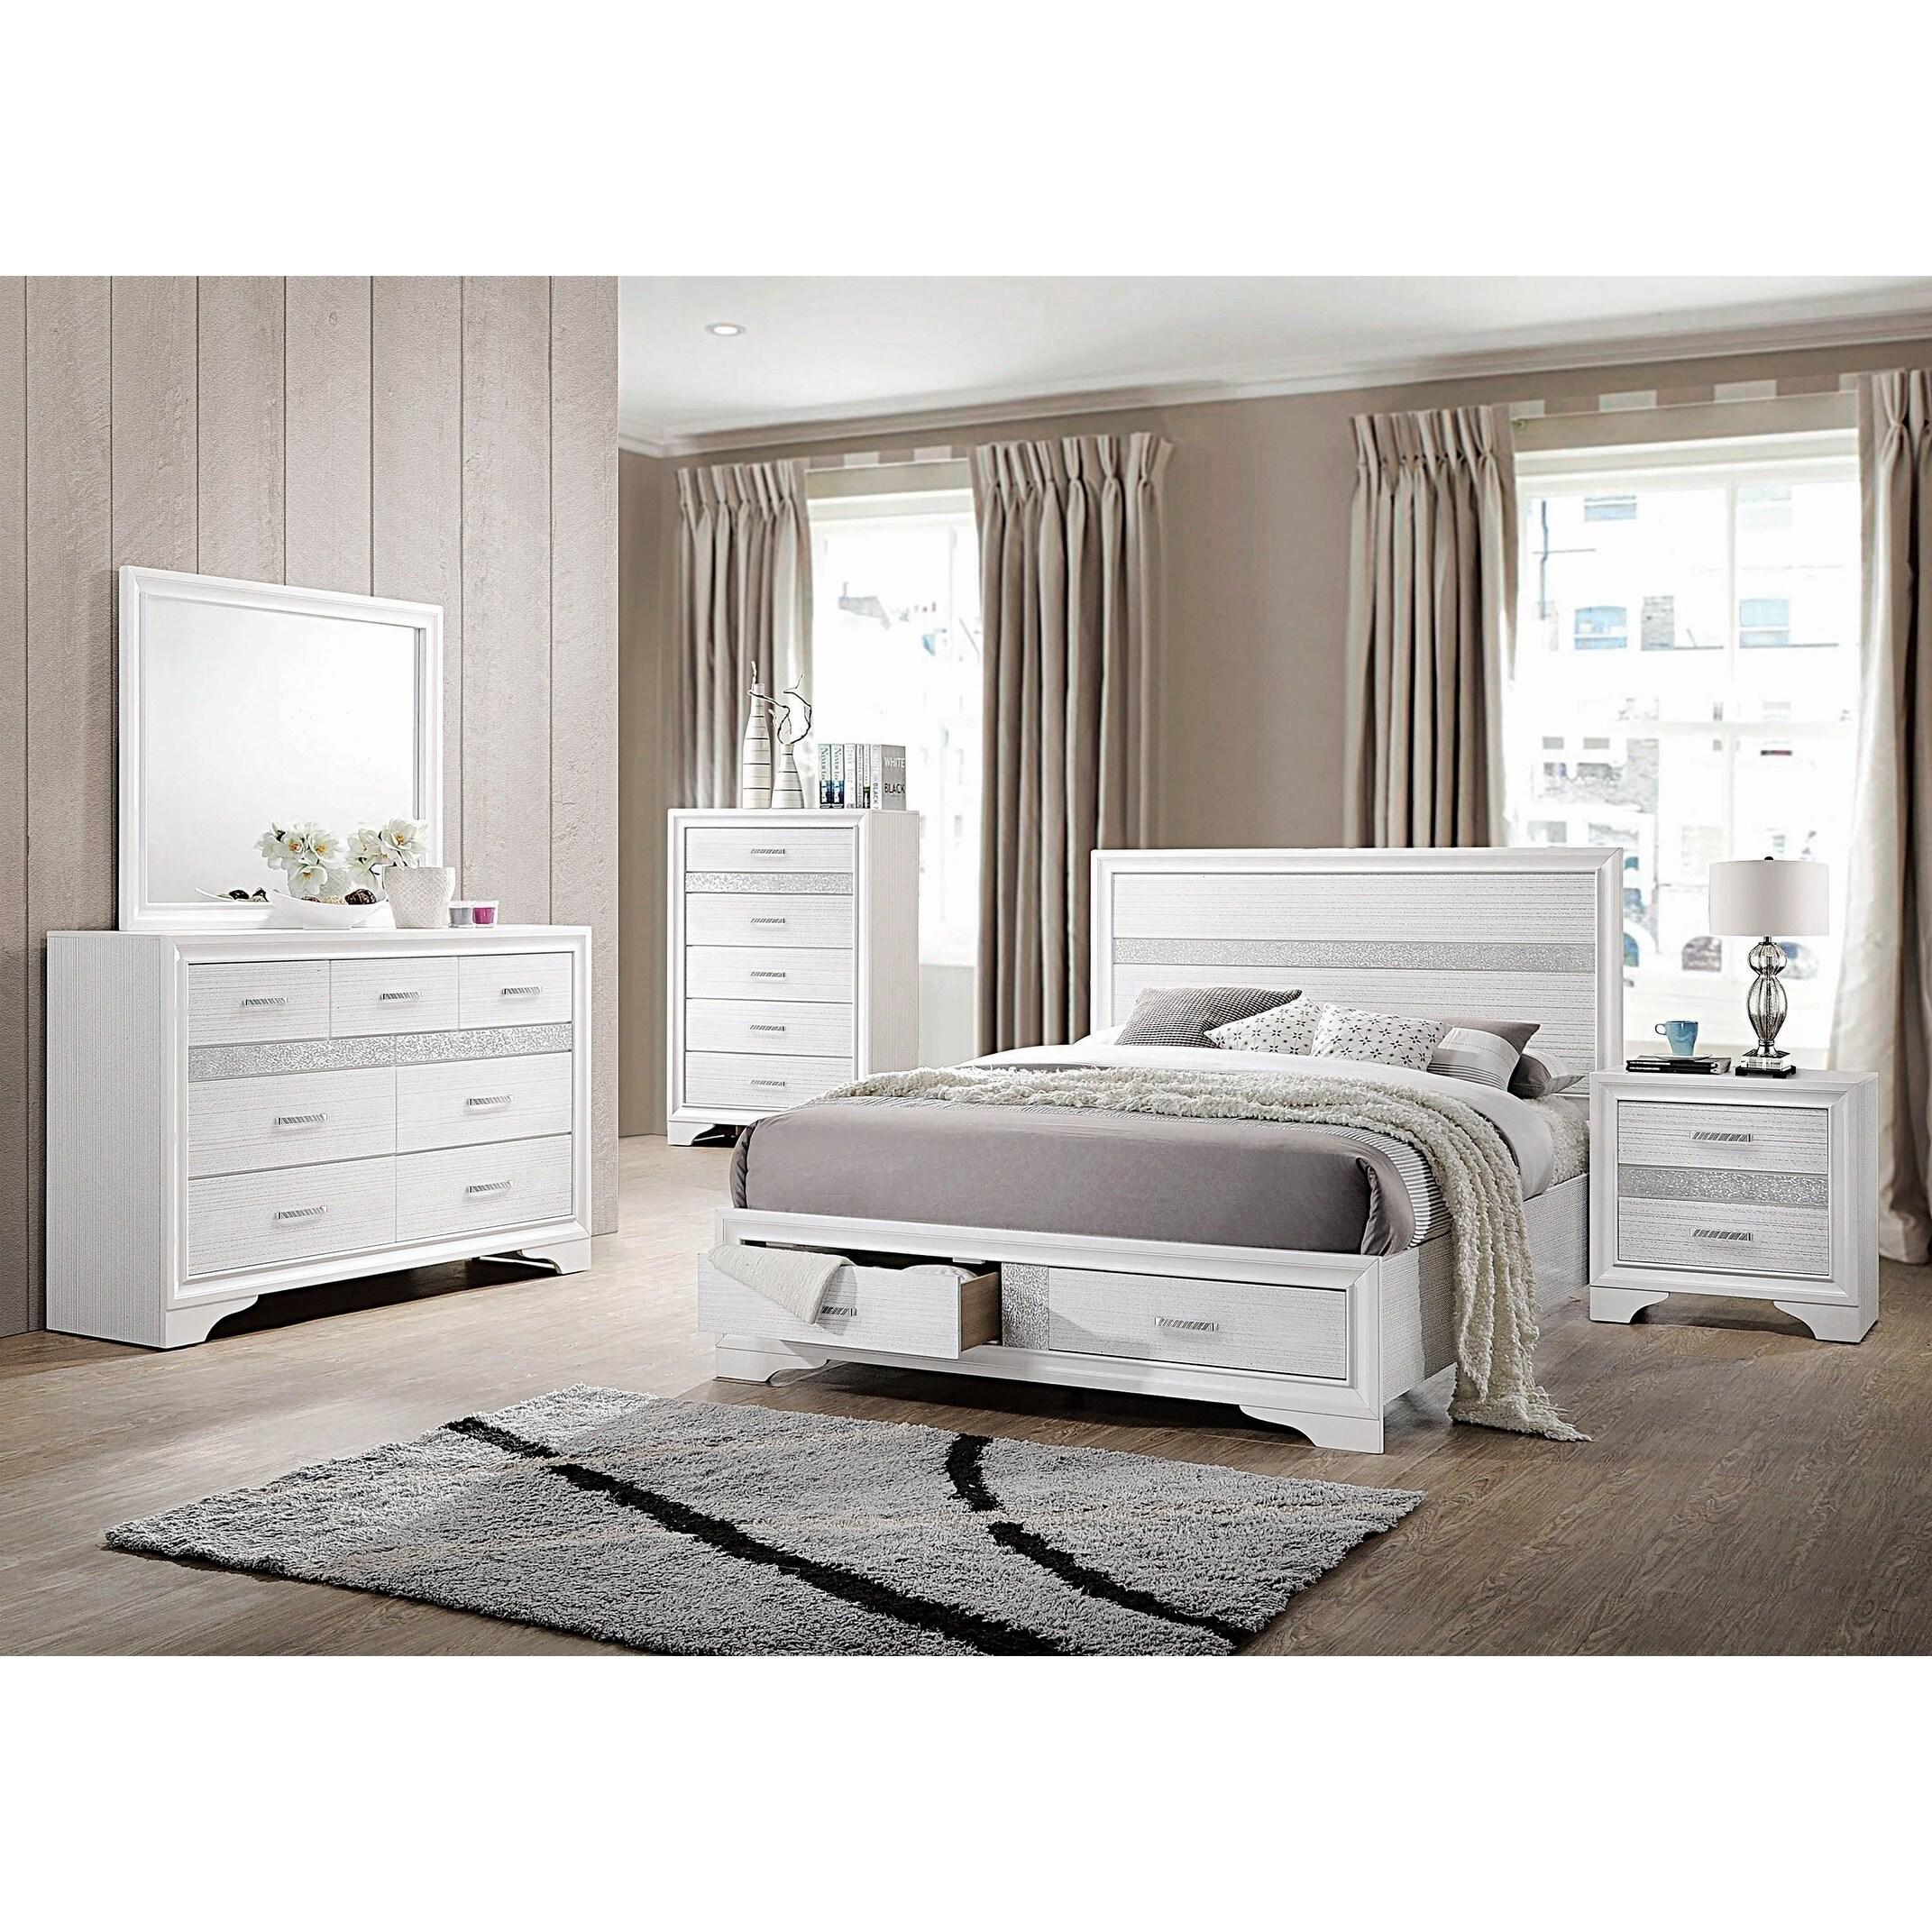 Alexandria Rhinestone 3-piece Storage Bedroom Set with Chest